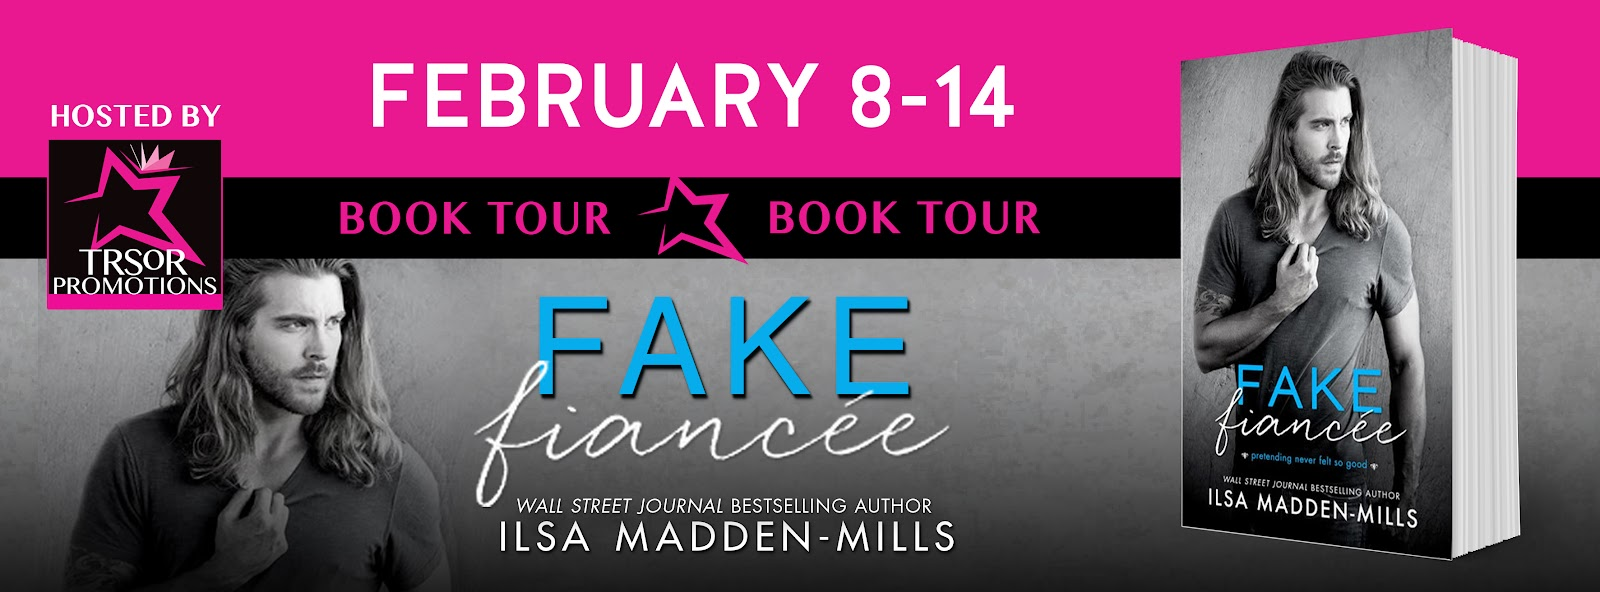 FAKE_FIANCEE_BOOK_TOUR.jpg